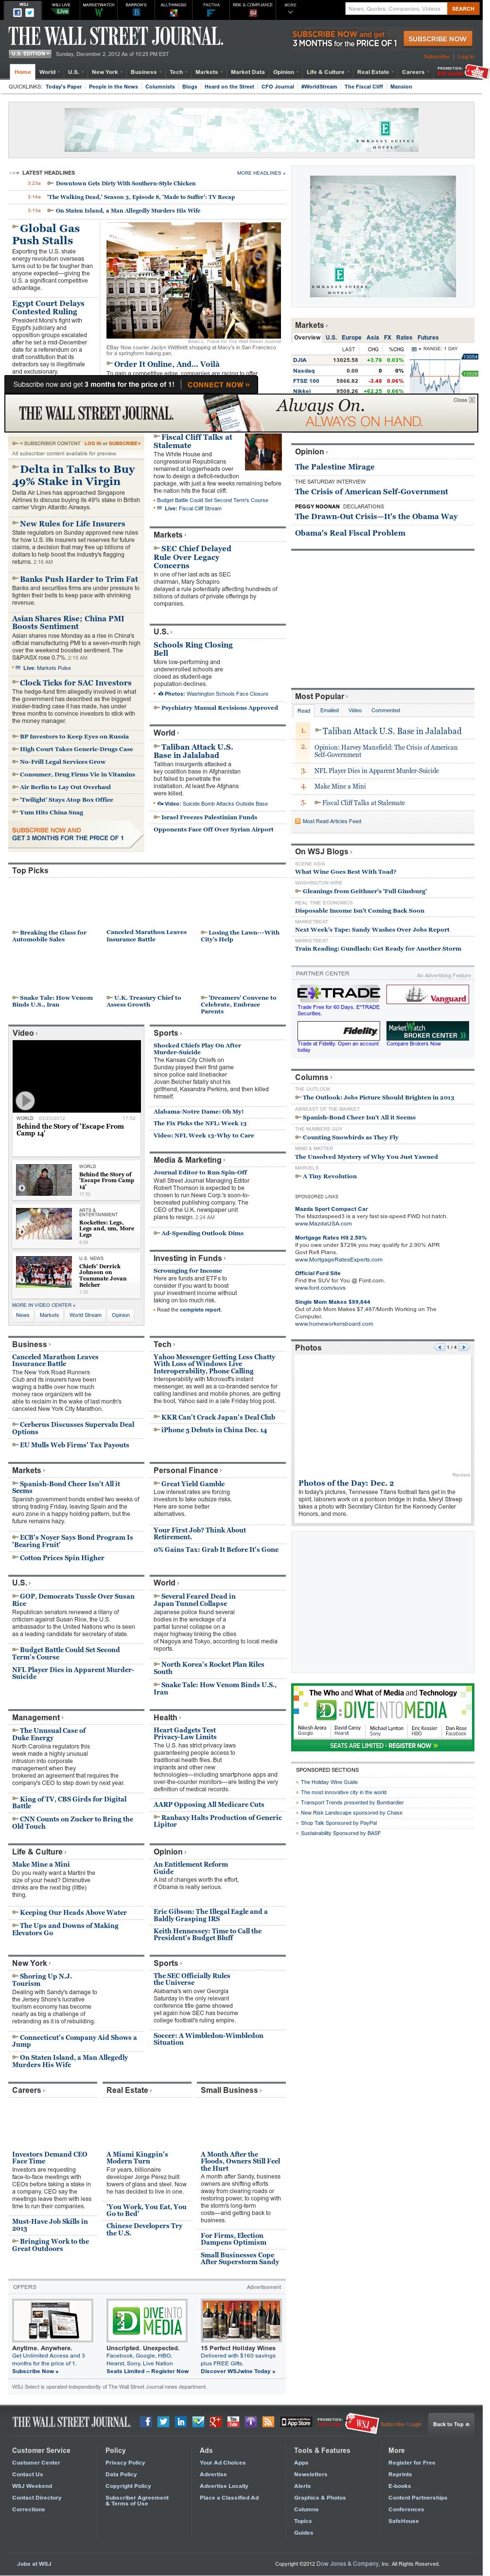 The Wall Street Journal at Monday Dec. 3, 2012, 3:34 a.m. UTC